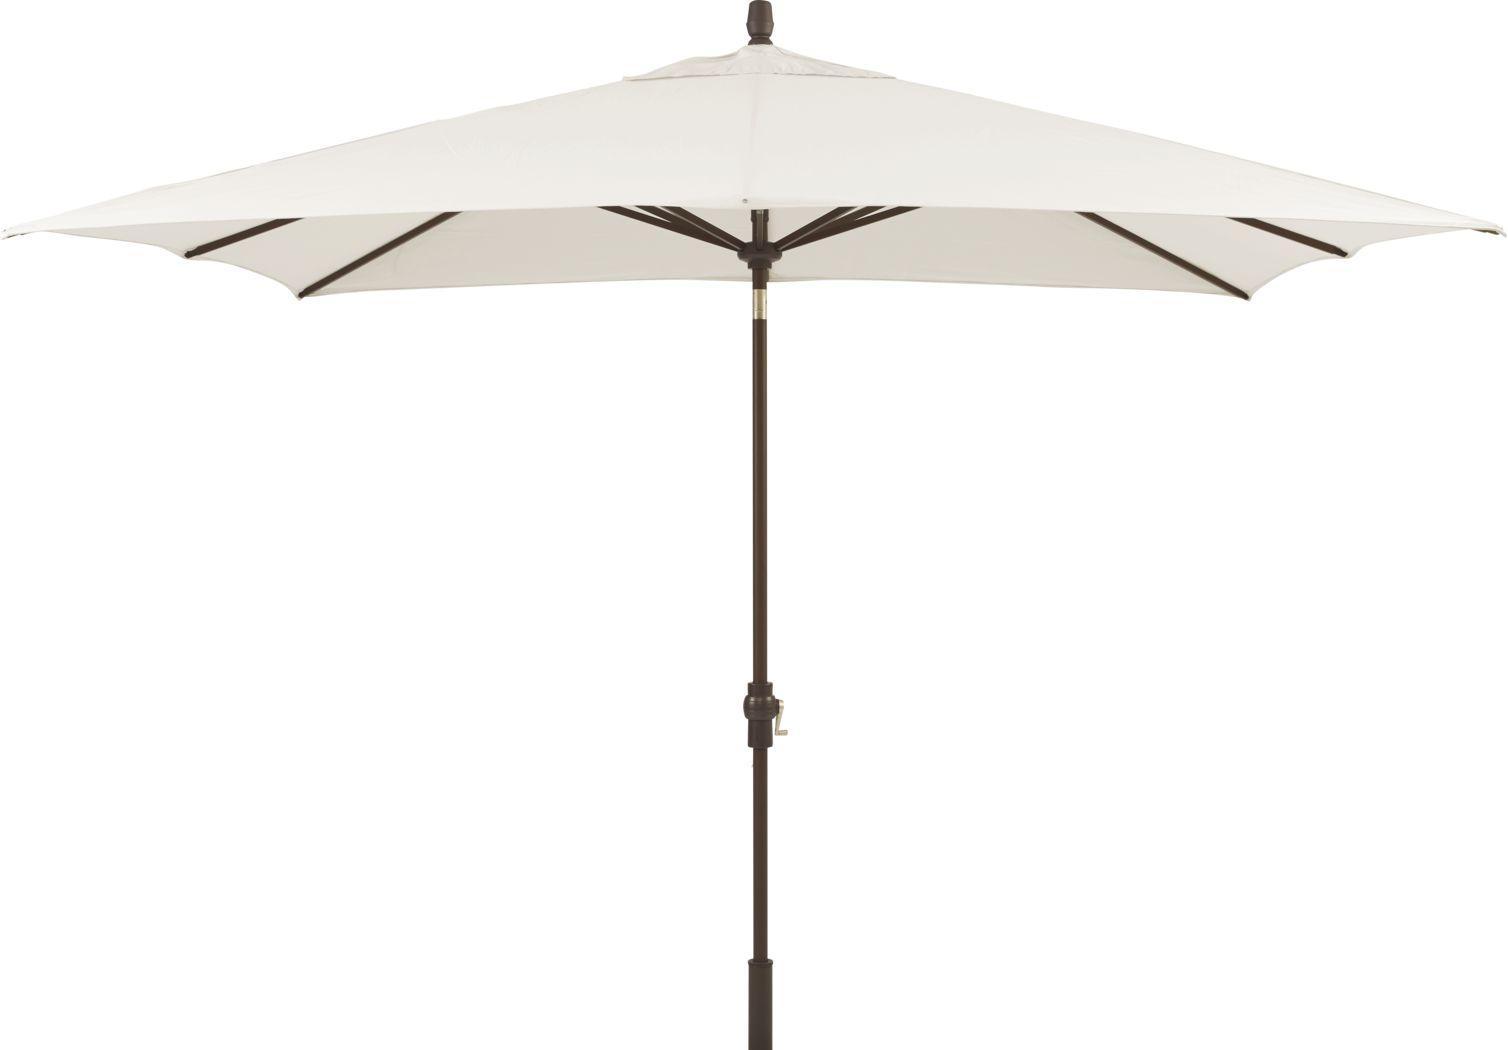 Seaport 8 x 10 Rectangle Ivory Outdoor Umbrella